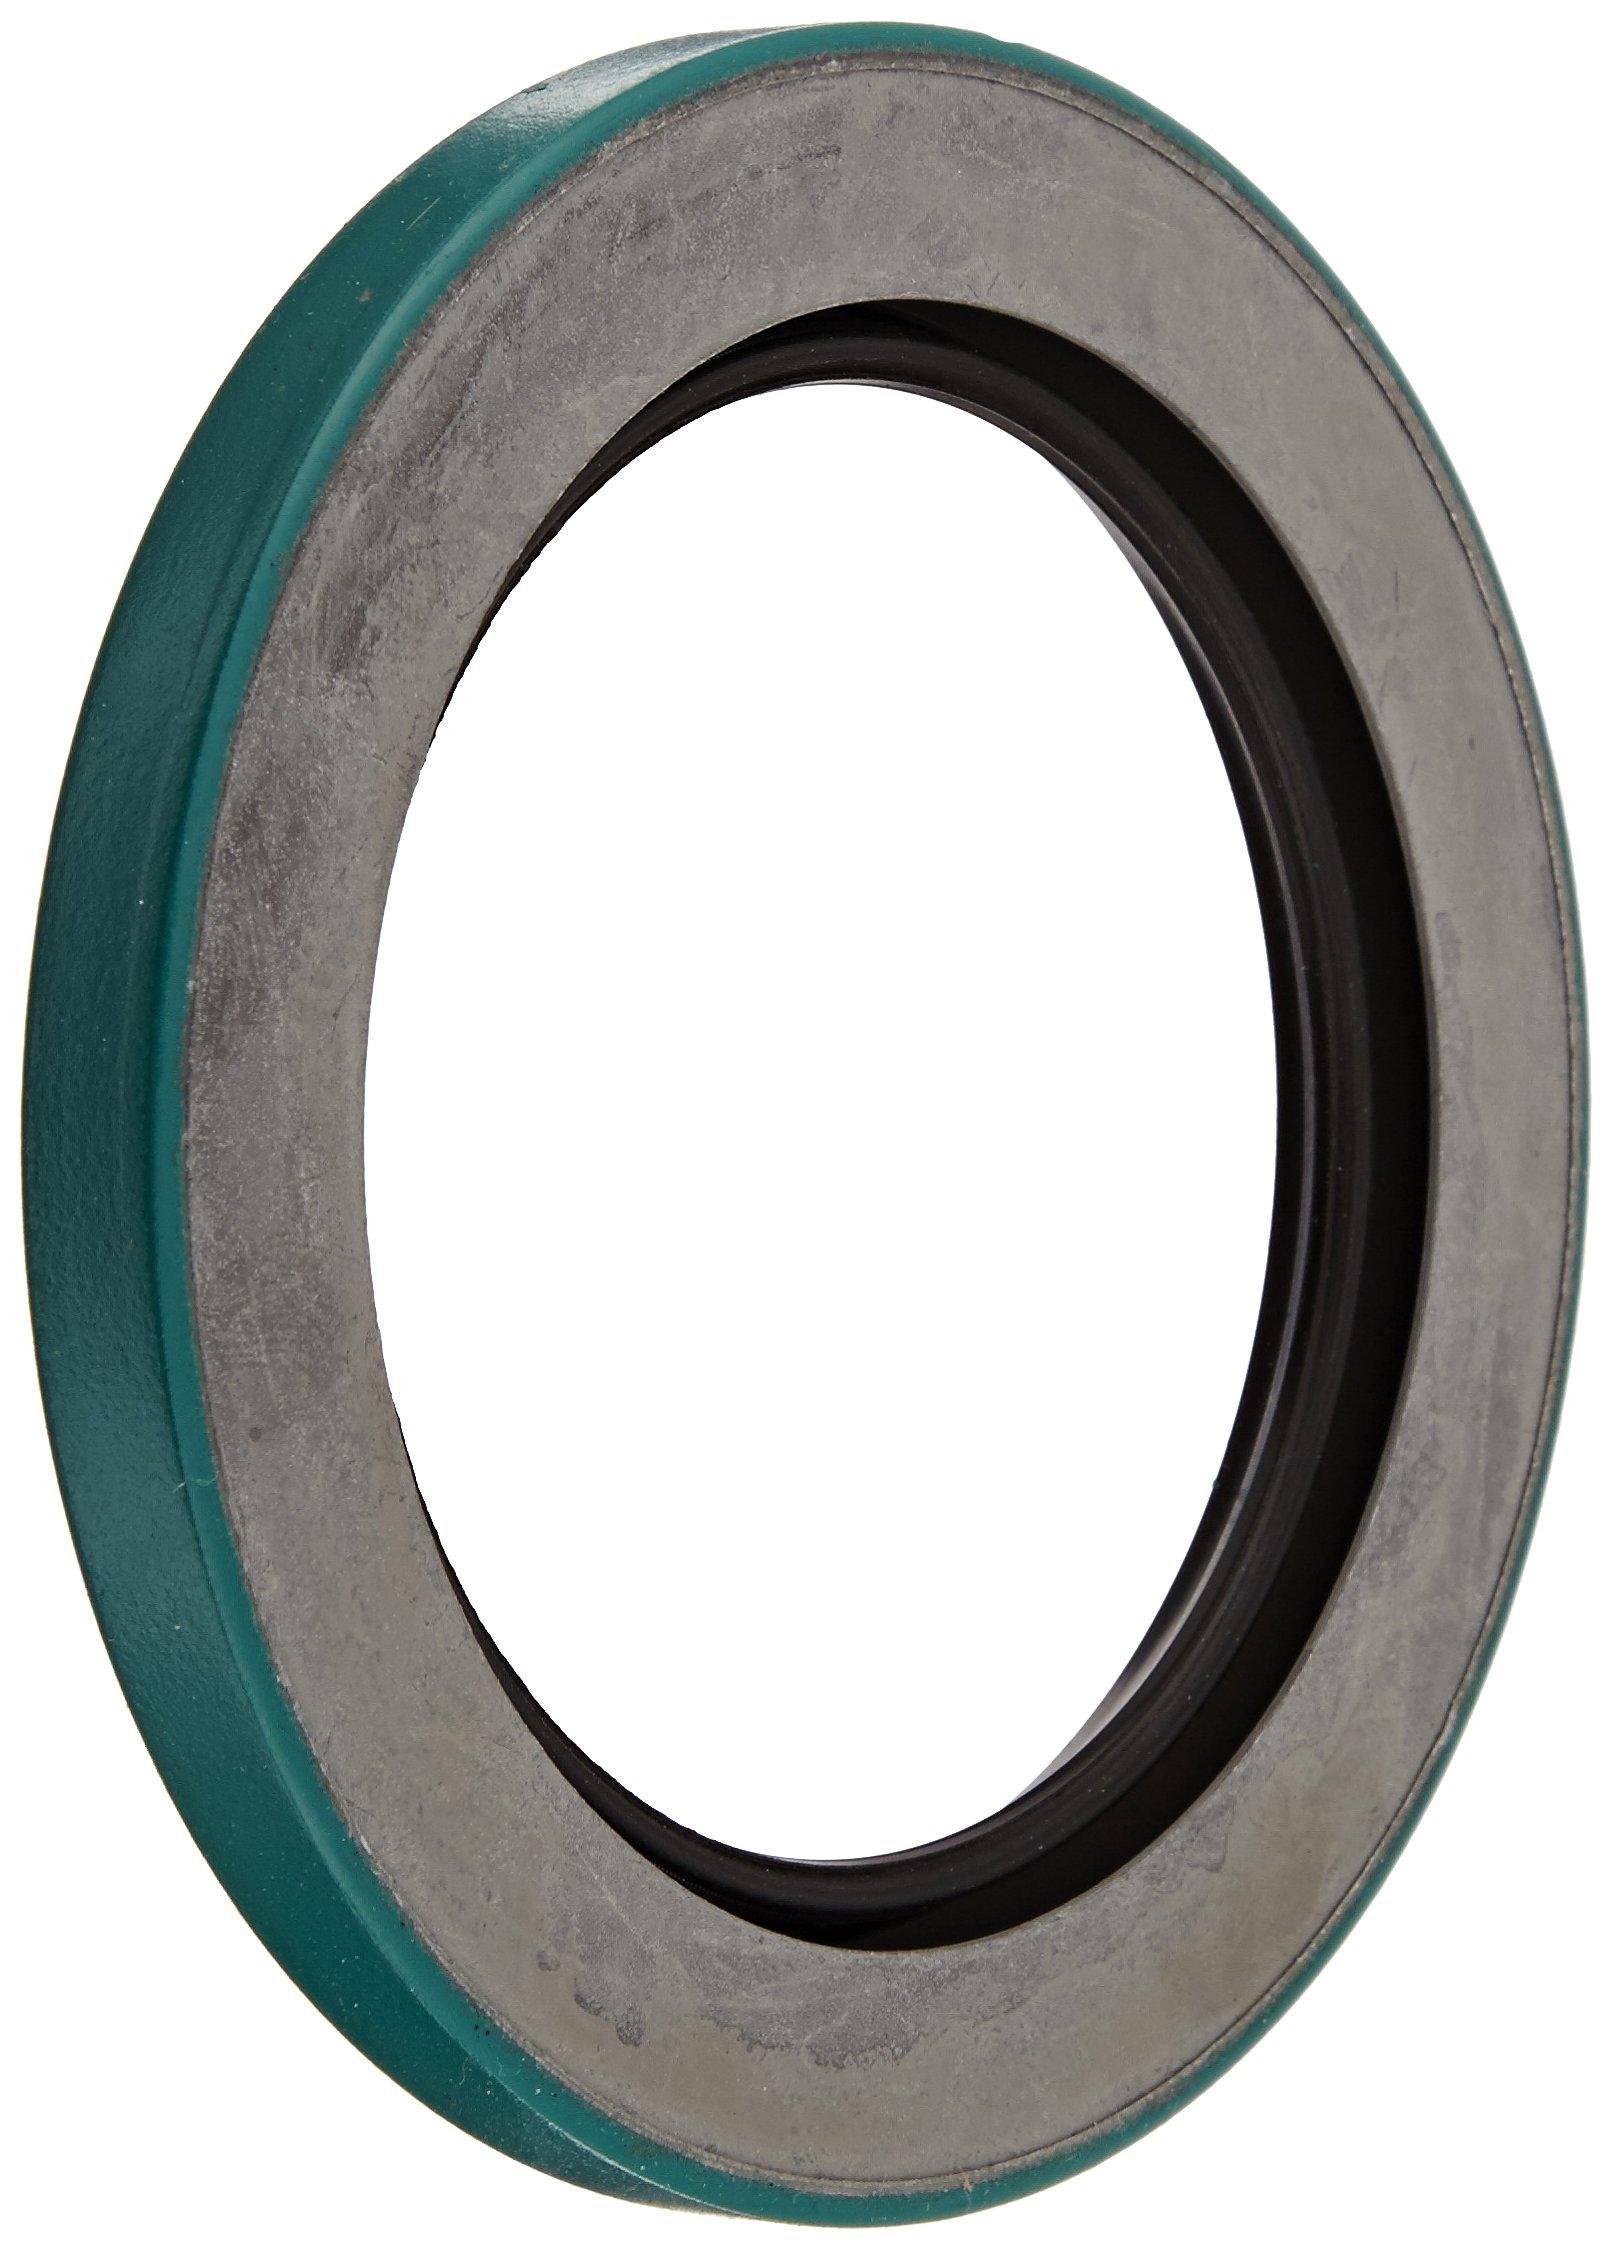 SKF 31269 LDS & Small Bore Seal, R Lip Code, CRWH1 Style, Inch, 3.125'' Shaft Diameter, 4.501'' Bore Diameter, 0.438'' Width